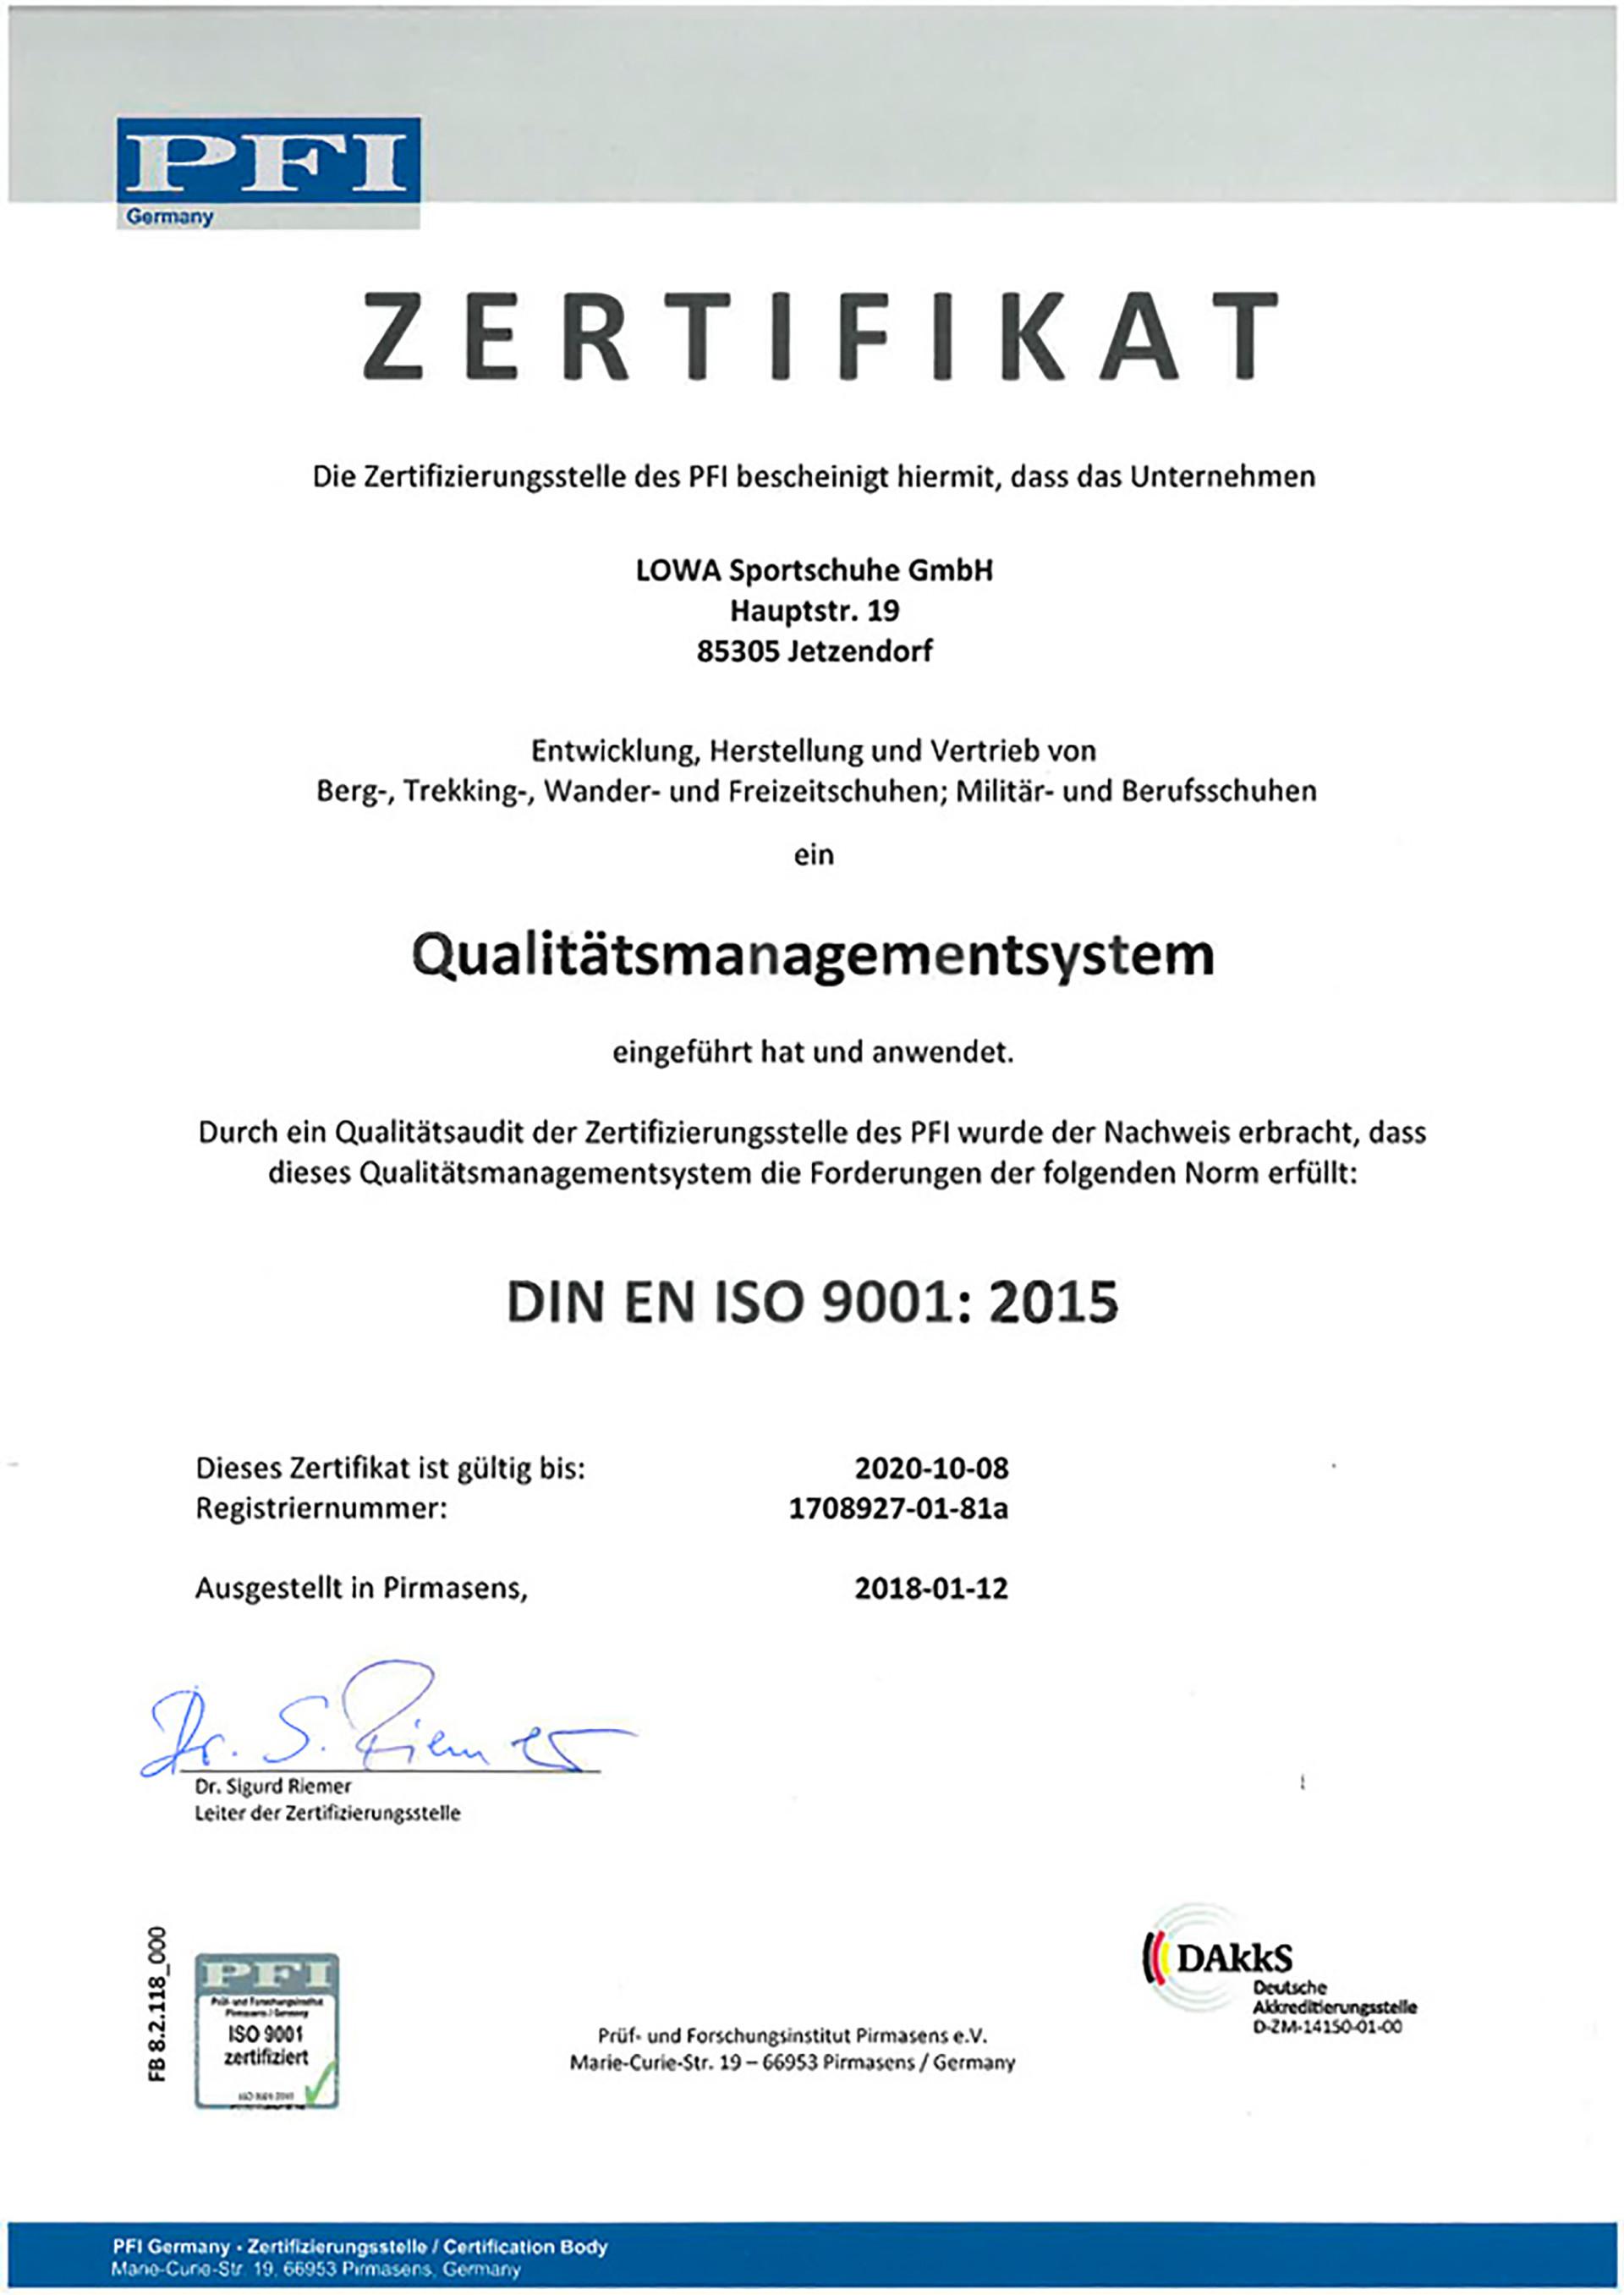 qm_zertifikat_deutsch_2017